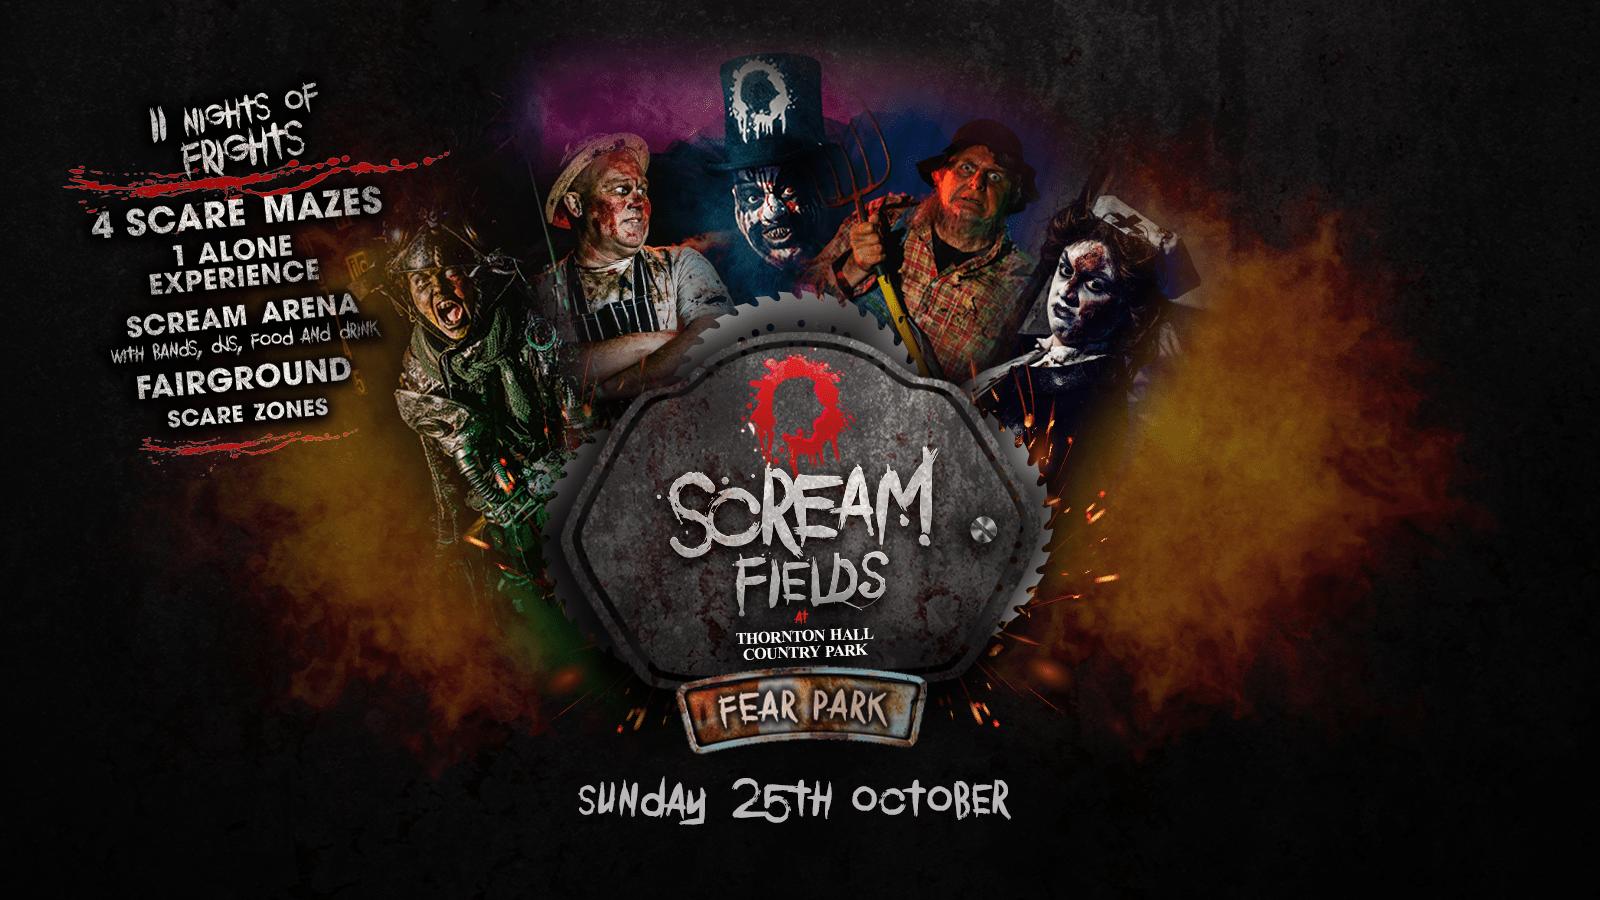 6.00PM – Screamfields: Sunday 25th October 2020